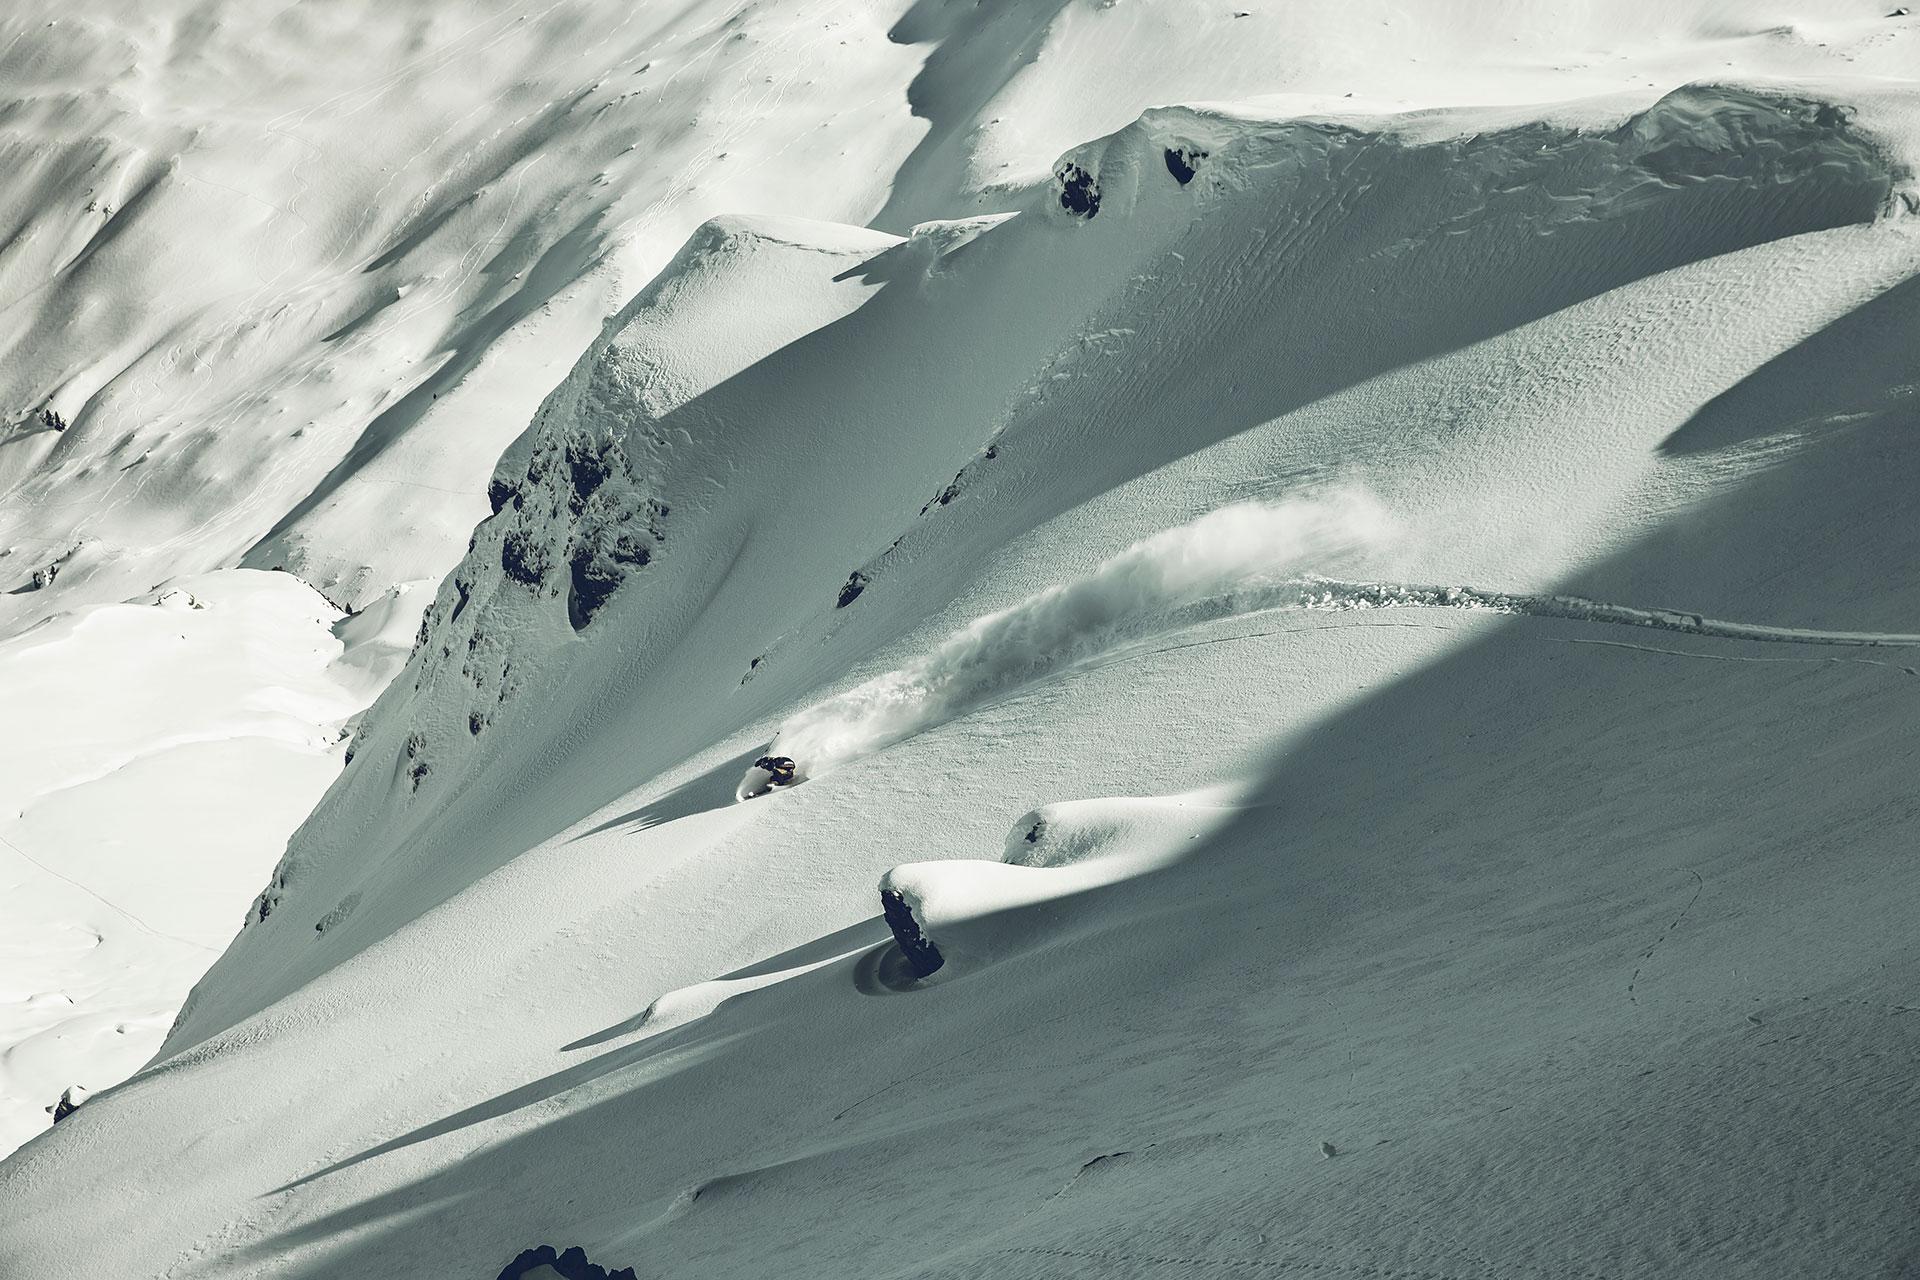 Tour Fotograf Winter Abfahrt Schwung Michael Müller Tiefschnee Splitboard Landschaft München